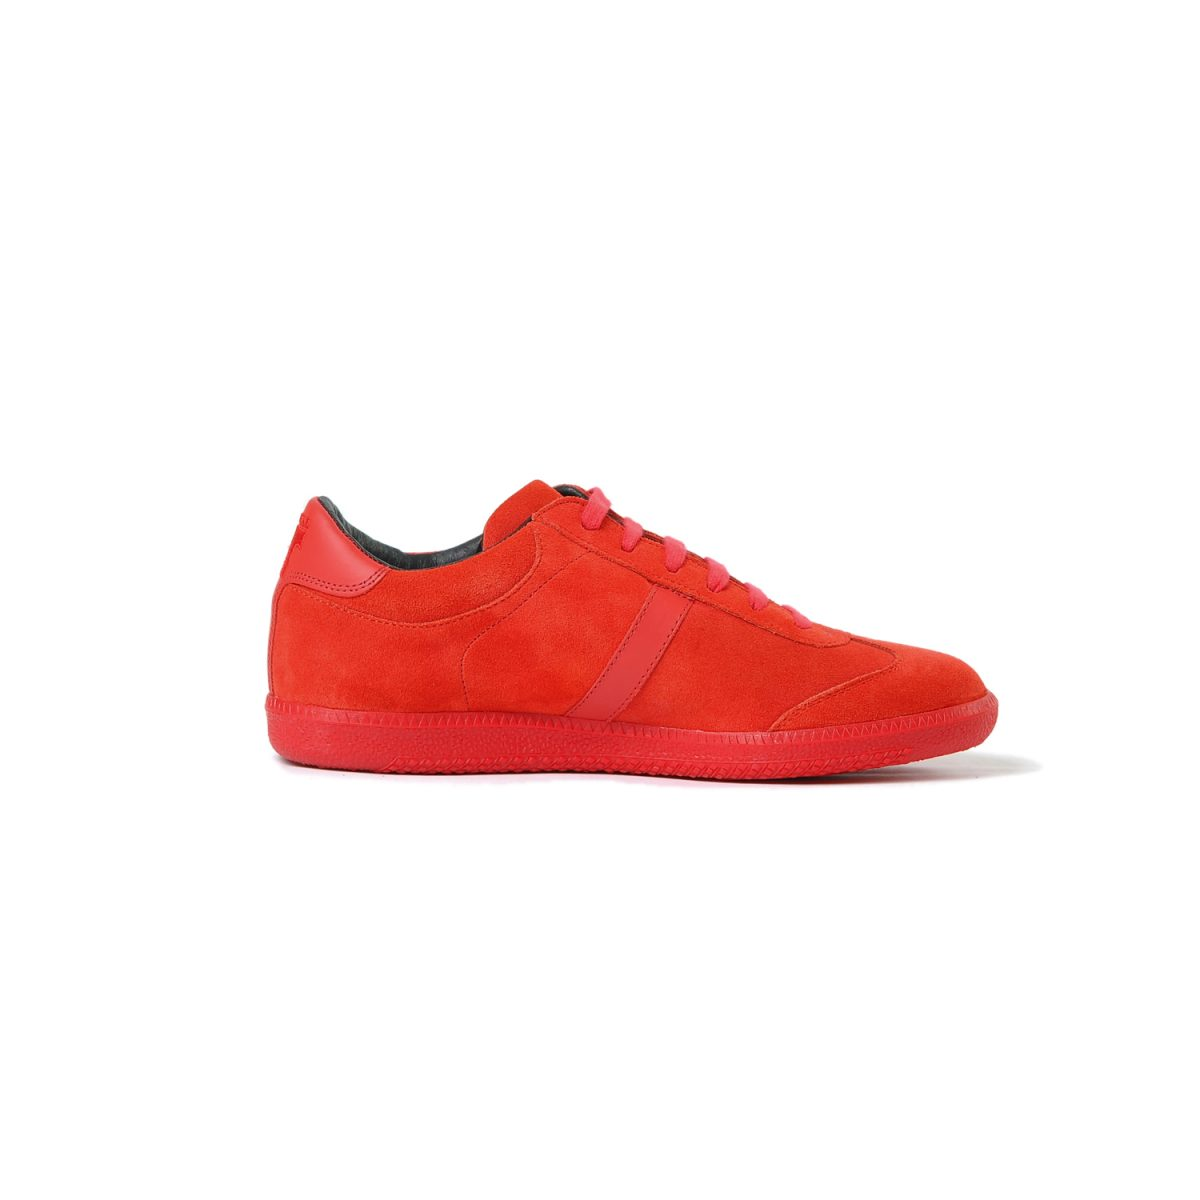 Tisza cipő - Compakt - Piros